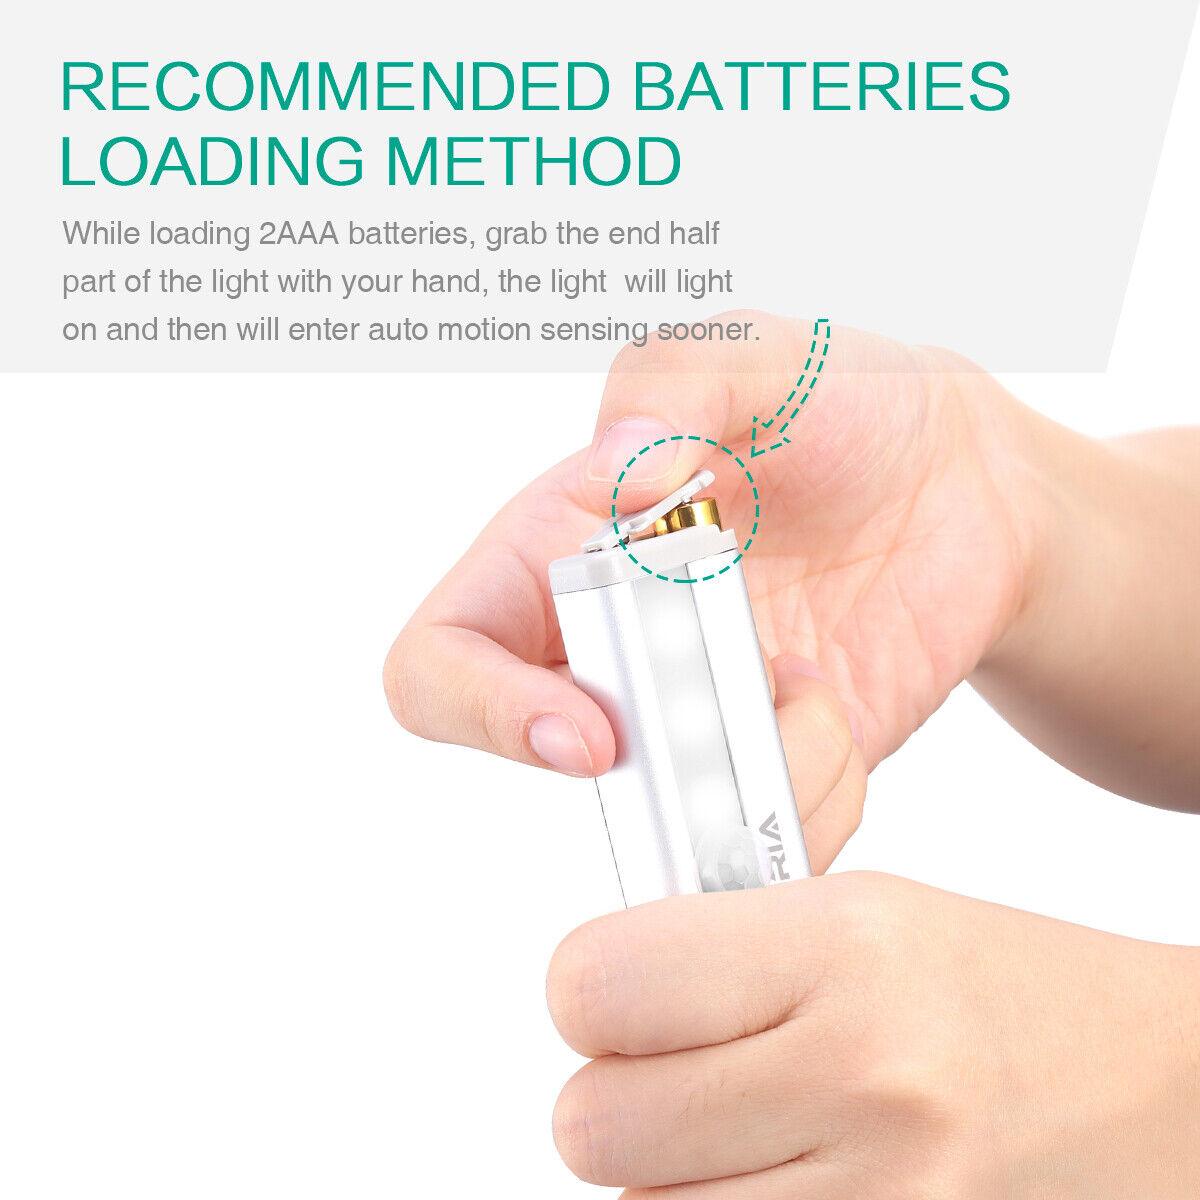 3x 6led Pir Motion Sensor Wireless Night Light Battery